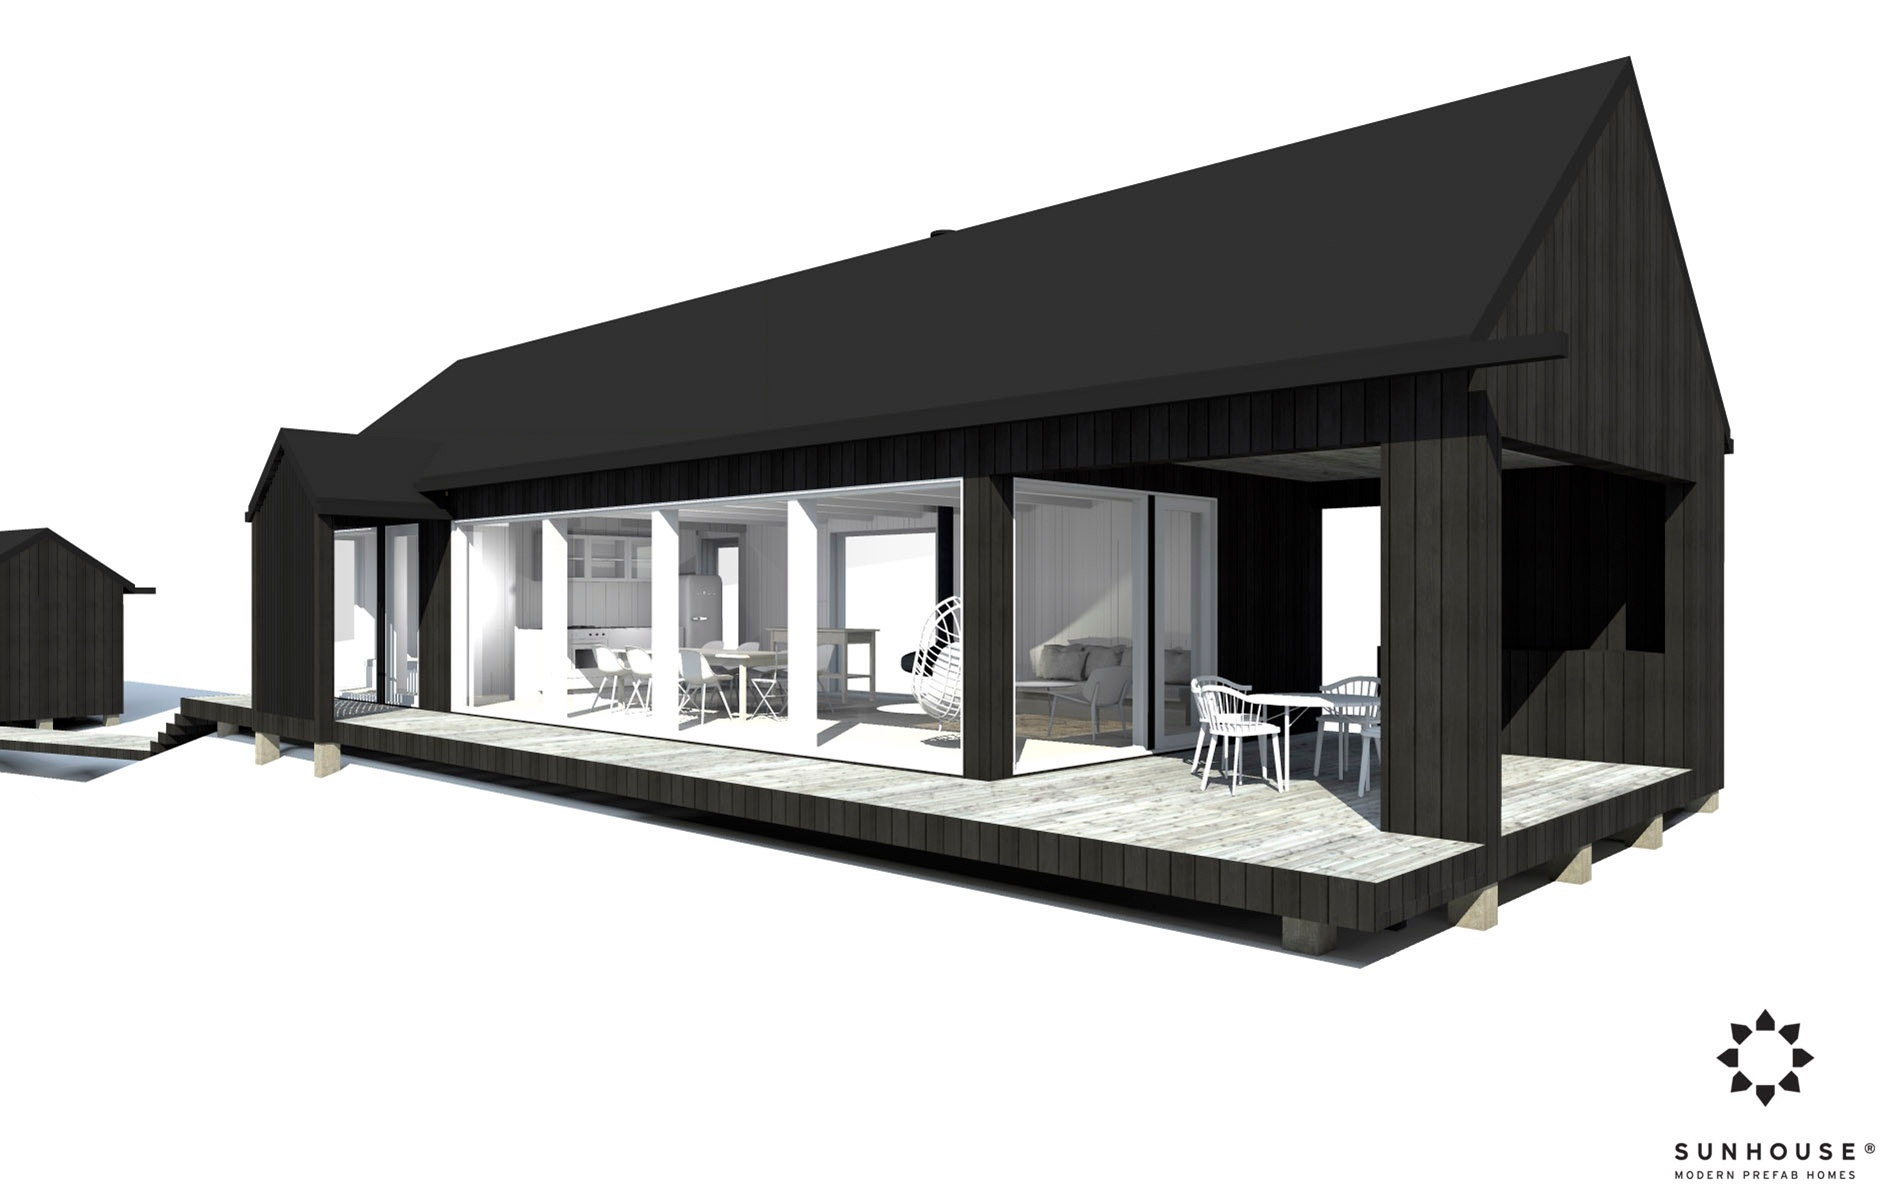 Sunhouse moderni mökki S1601_ulkoa(2)